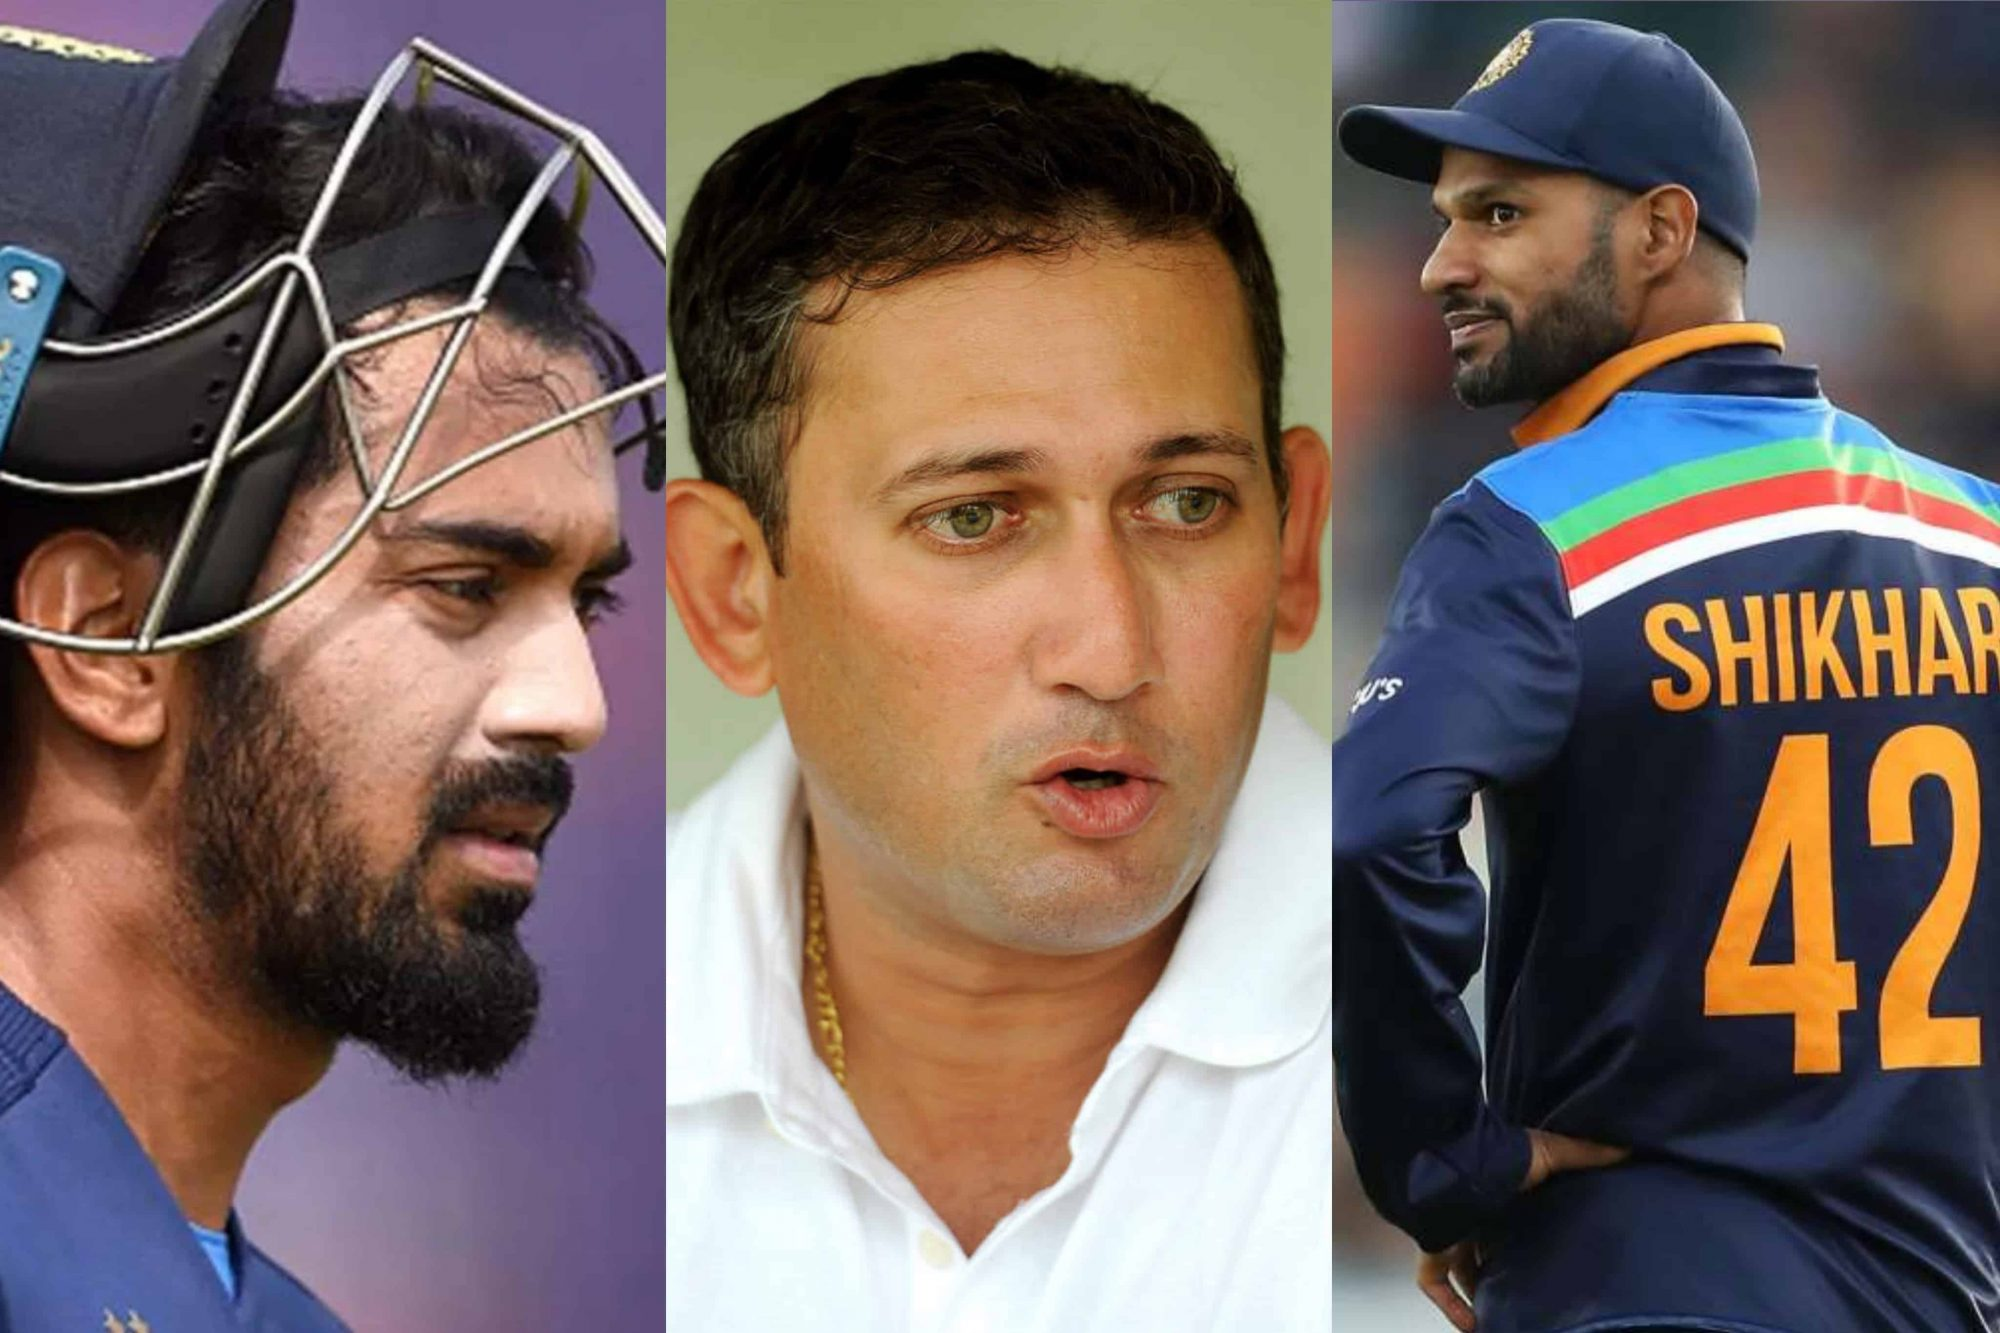 """Can Put Pressure On KL Rahul To Get Your Spot Back In XI"" - Ajit Agarkar On Shikhar Dhawan"